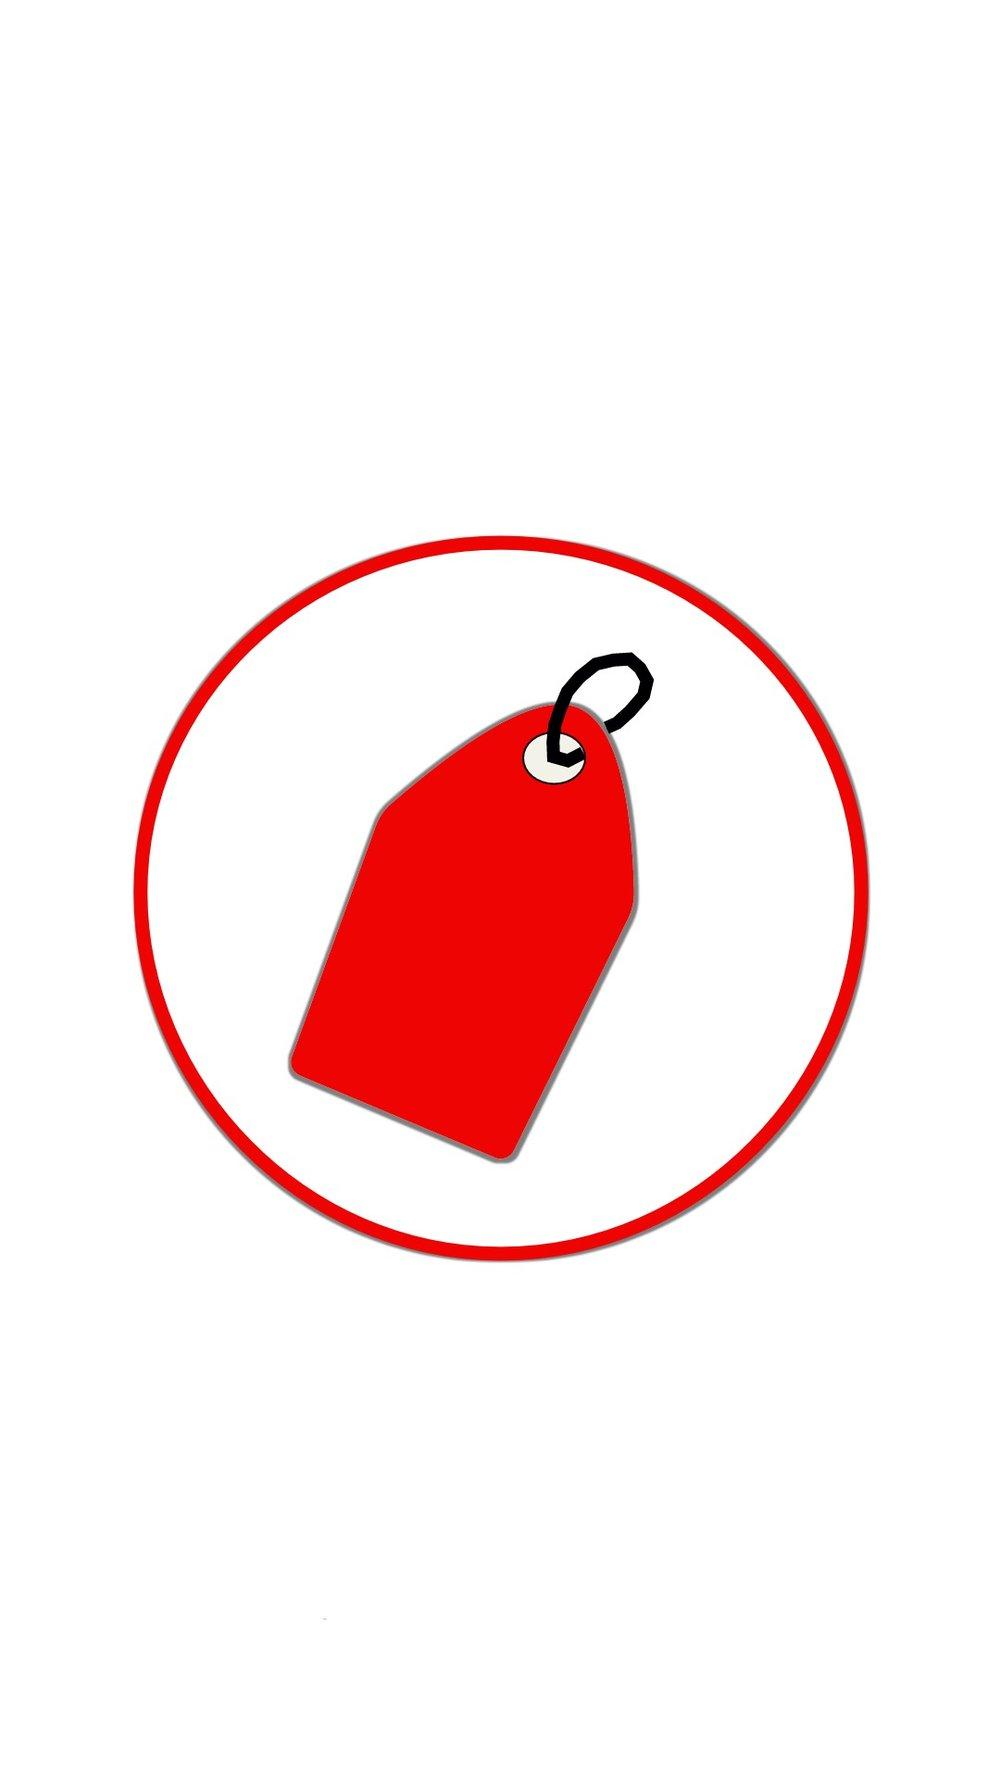 Instagram-cover-tag-red-white-lotnotes.com.jpg